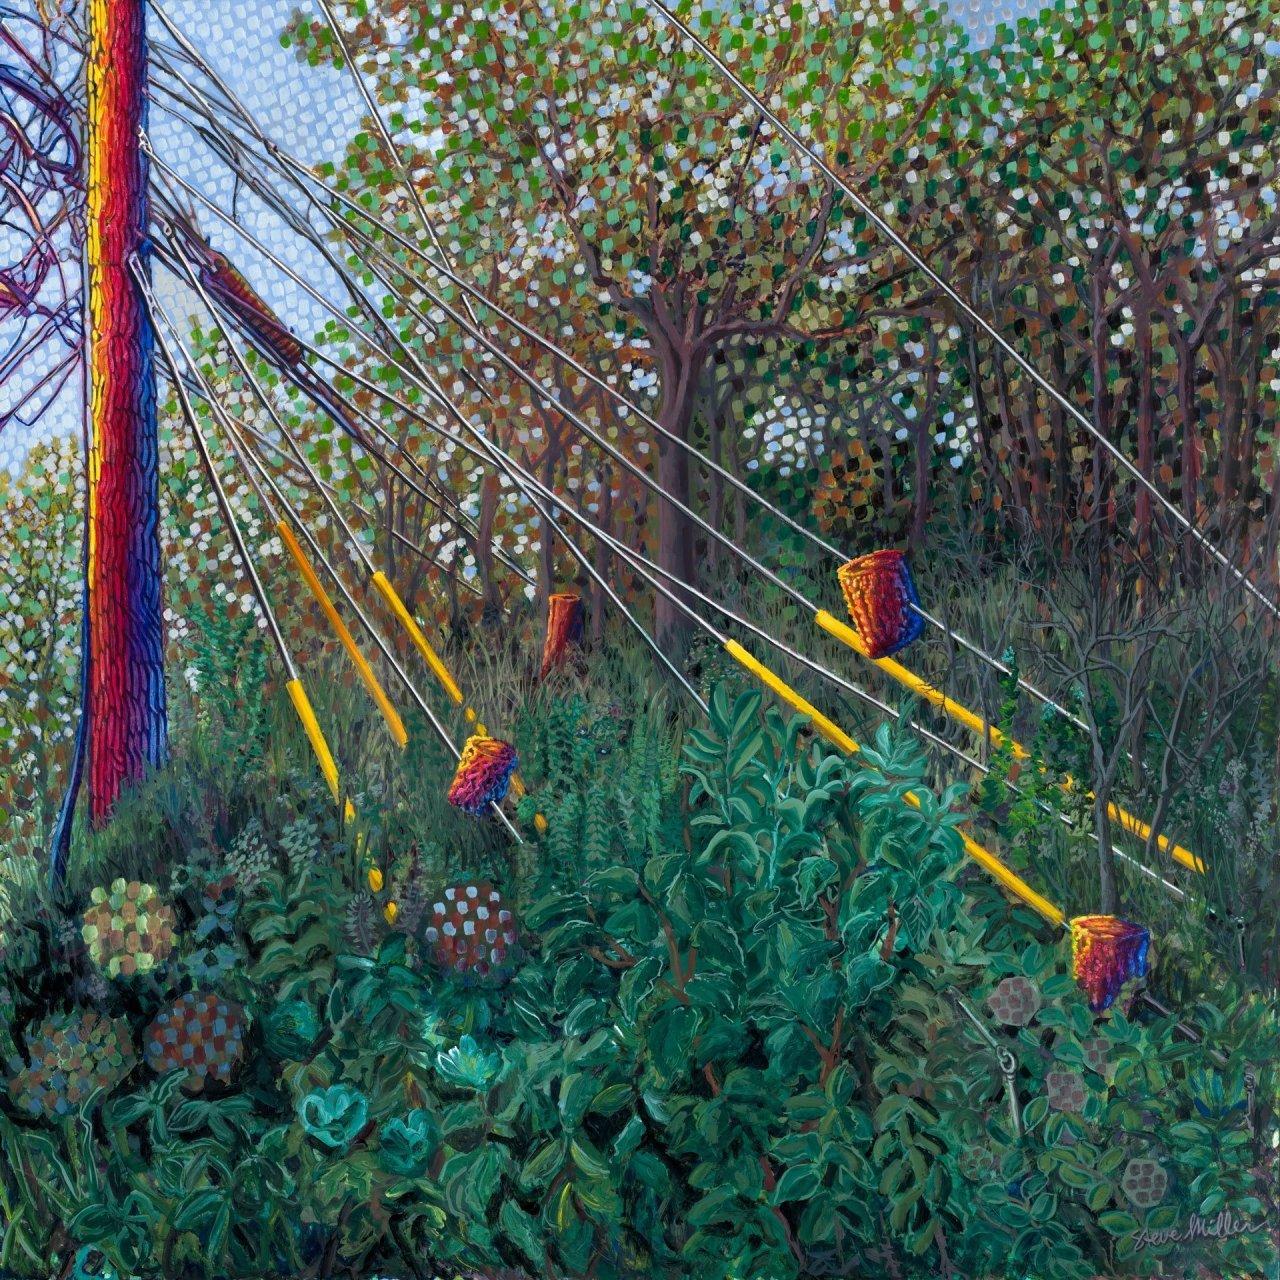 Unexpected Garden 36''' x 36''' x 1.5'' acrylic on wood panel 10/11/19 © Steve Miller 2019